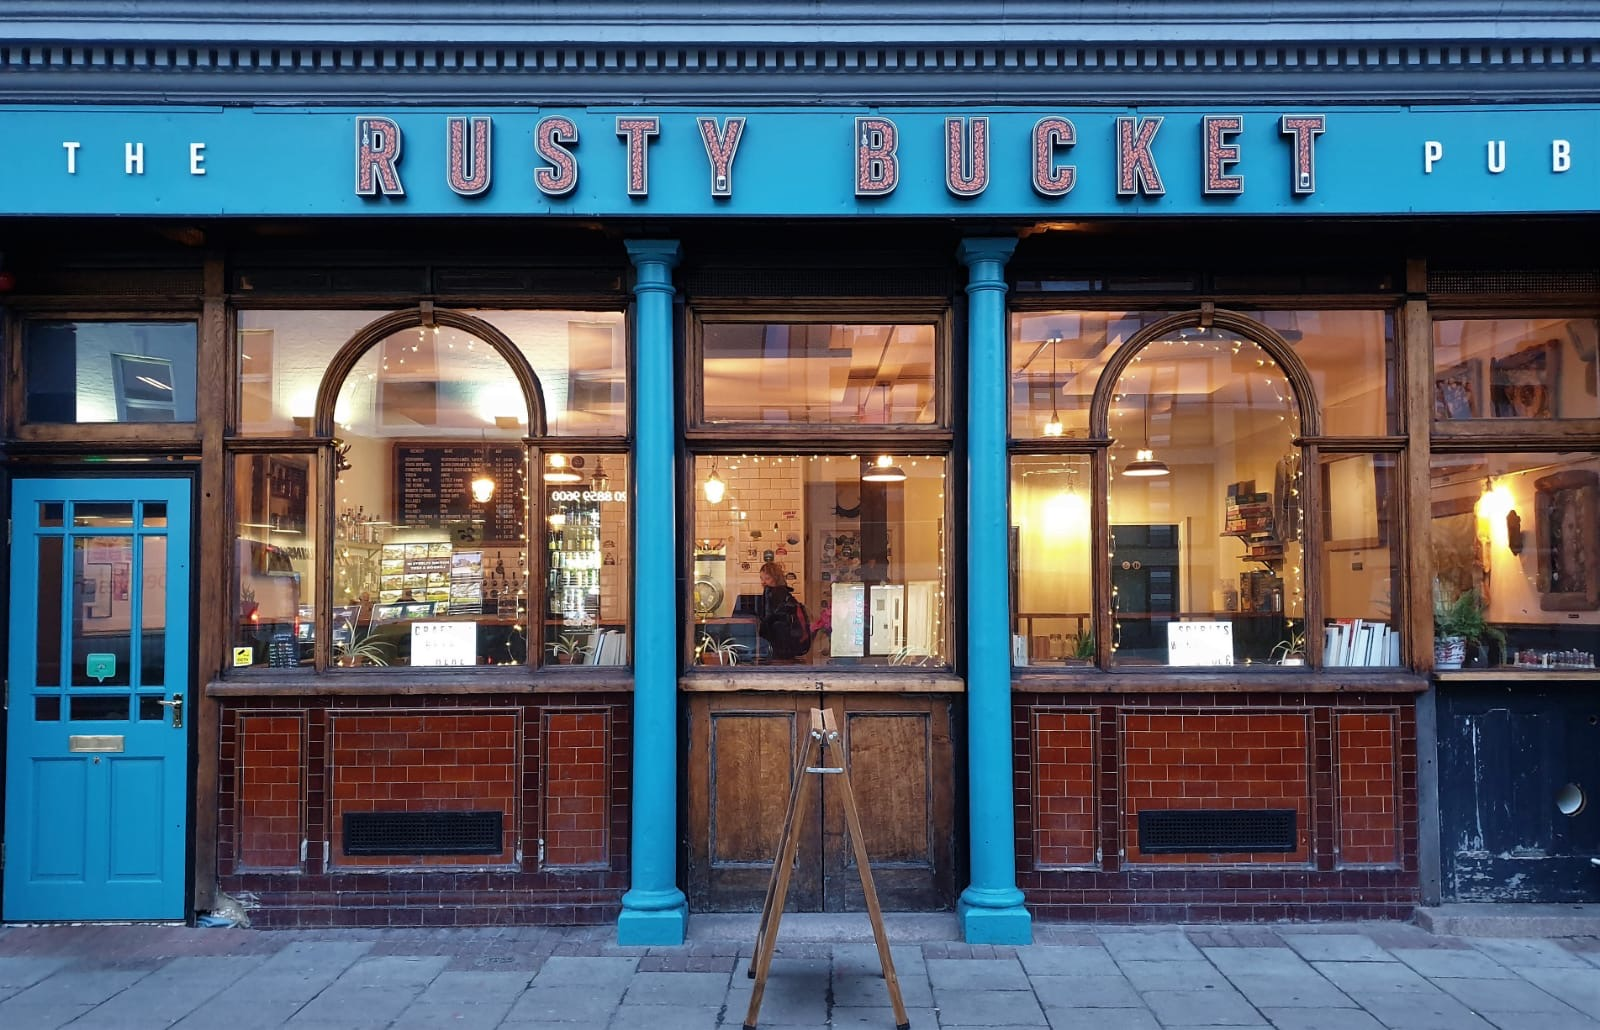 THE RUSTY BUCKET PUB